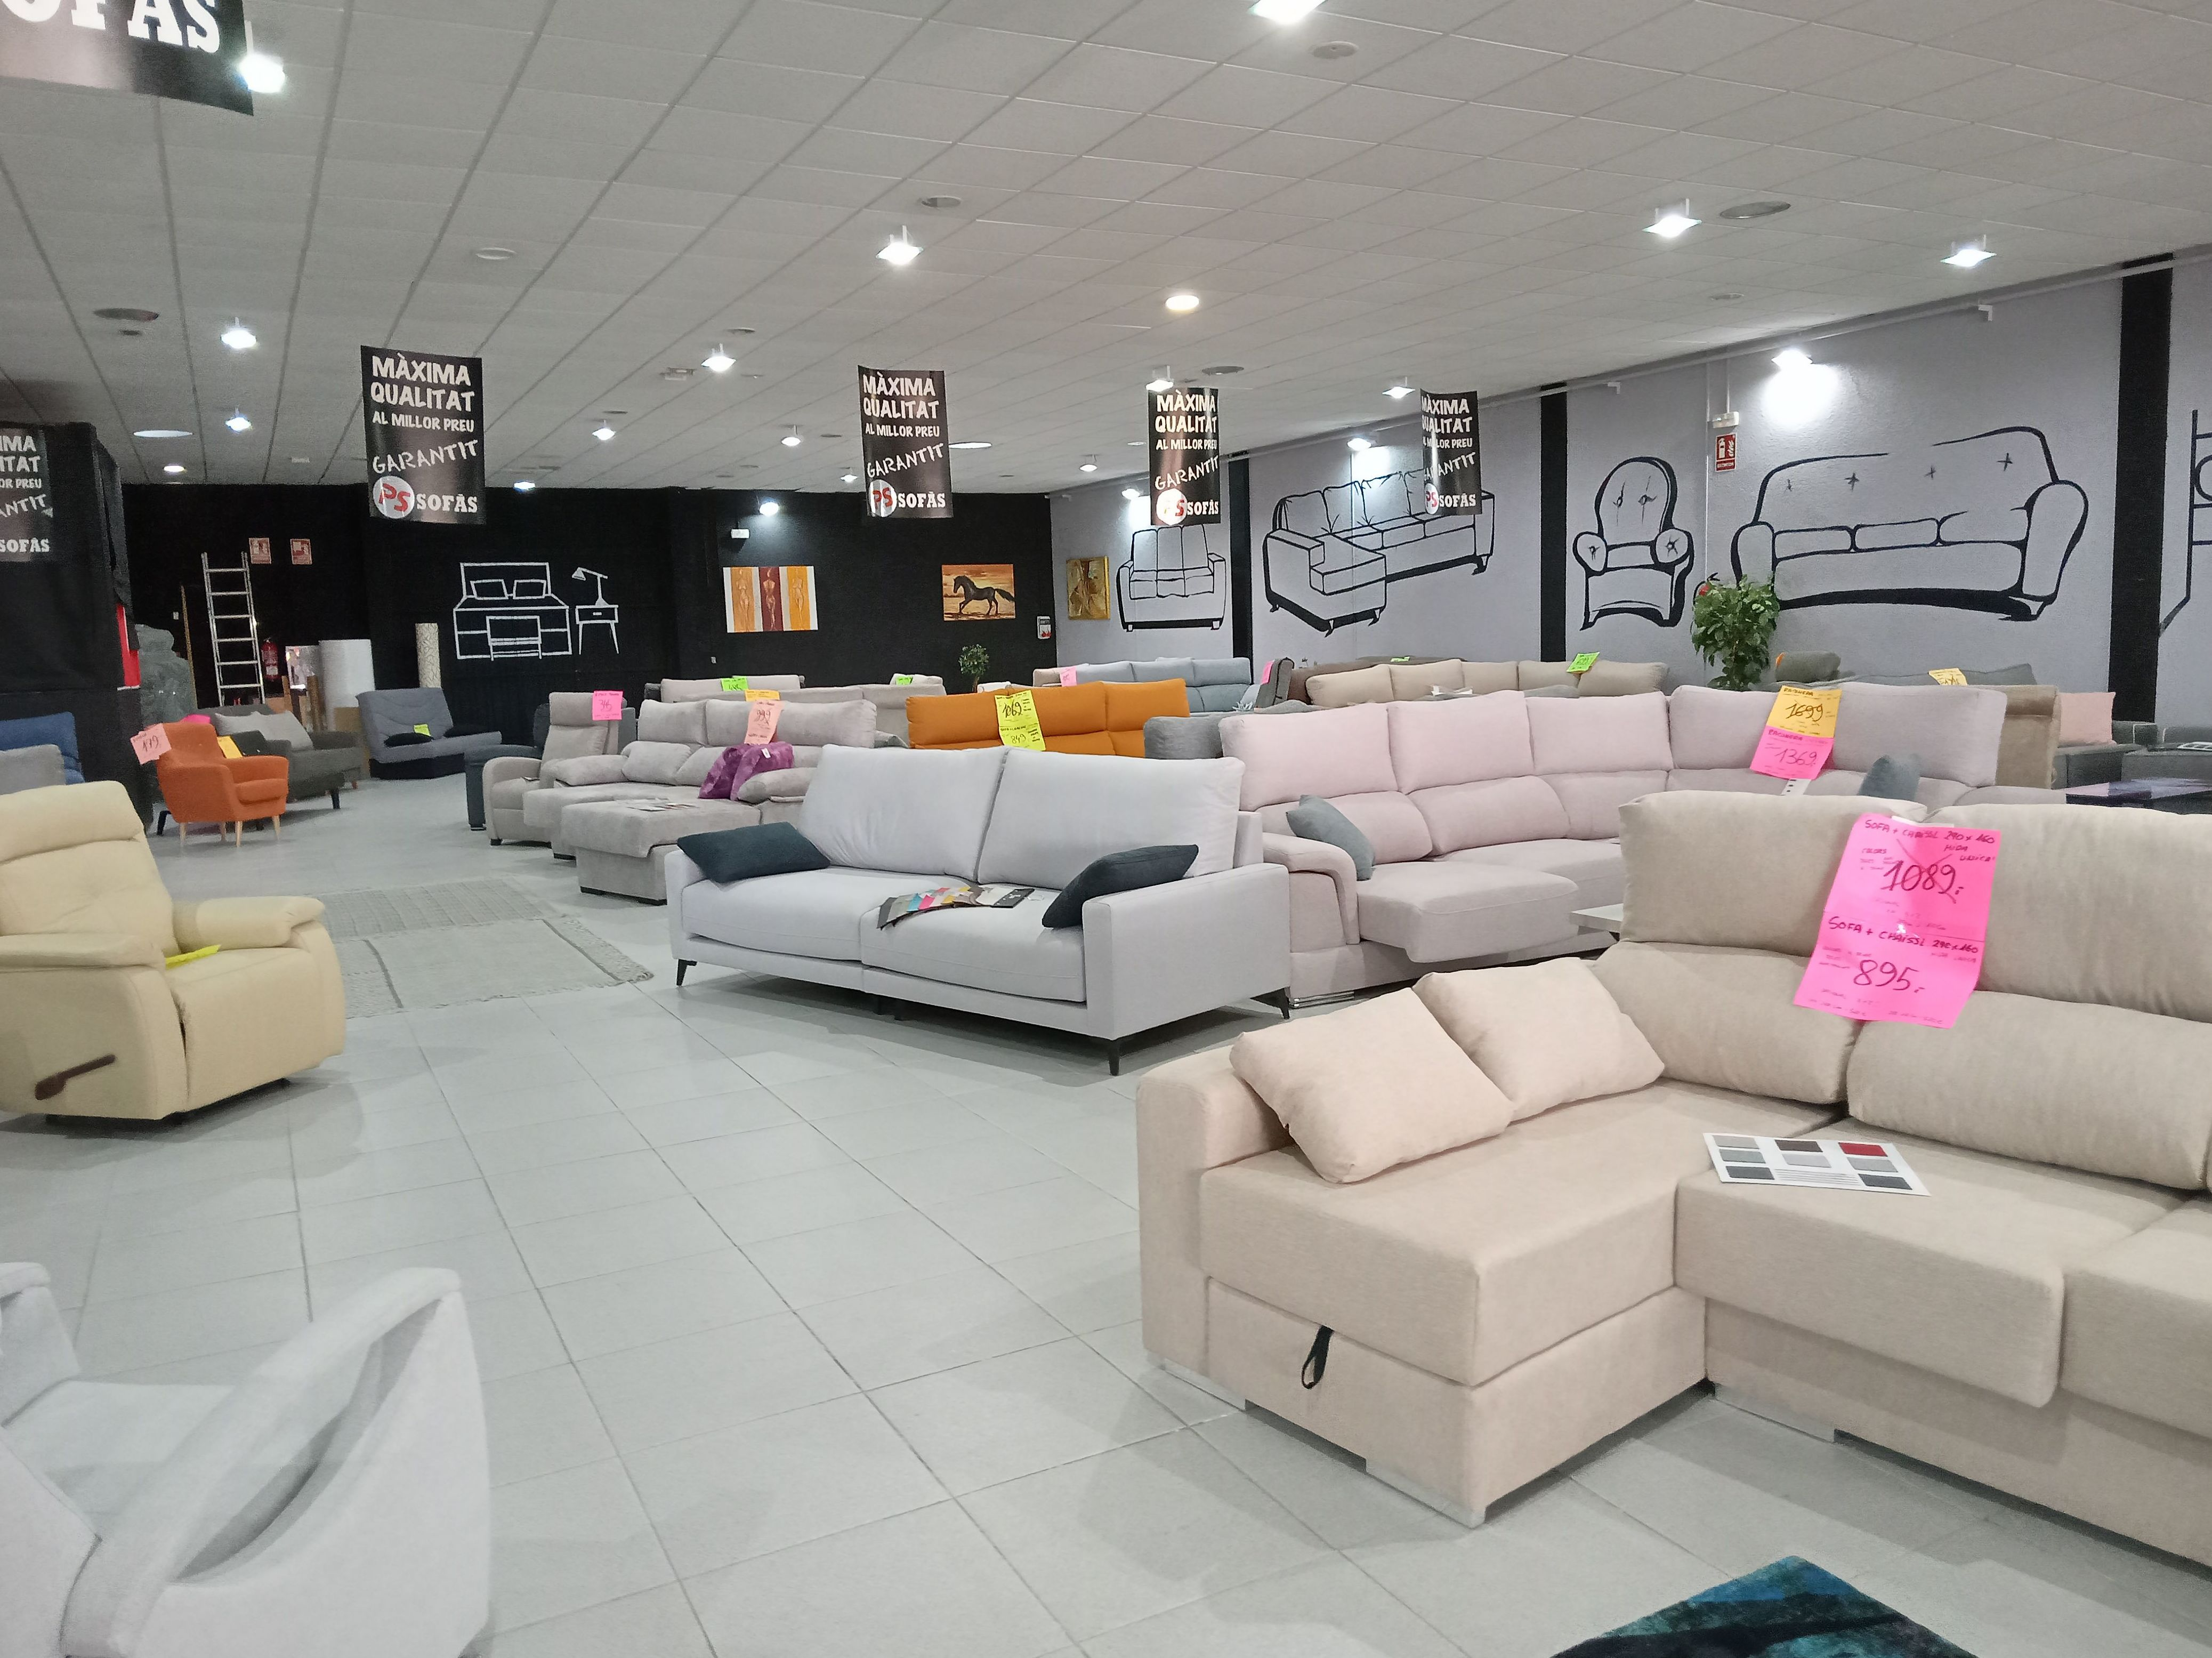 Foto 4 de Colchones, sofás y canapés en  | PS Sofás